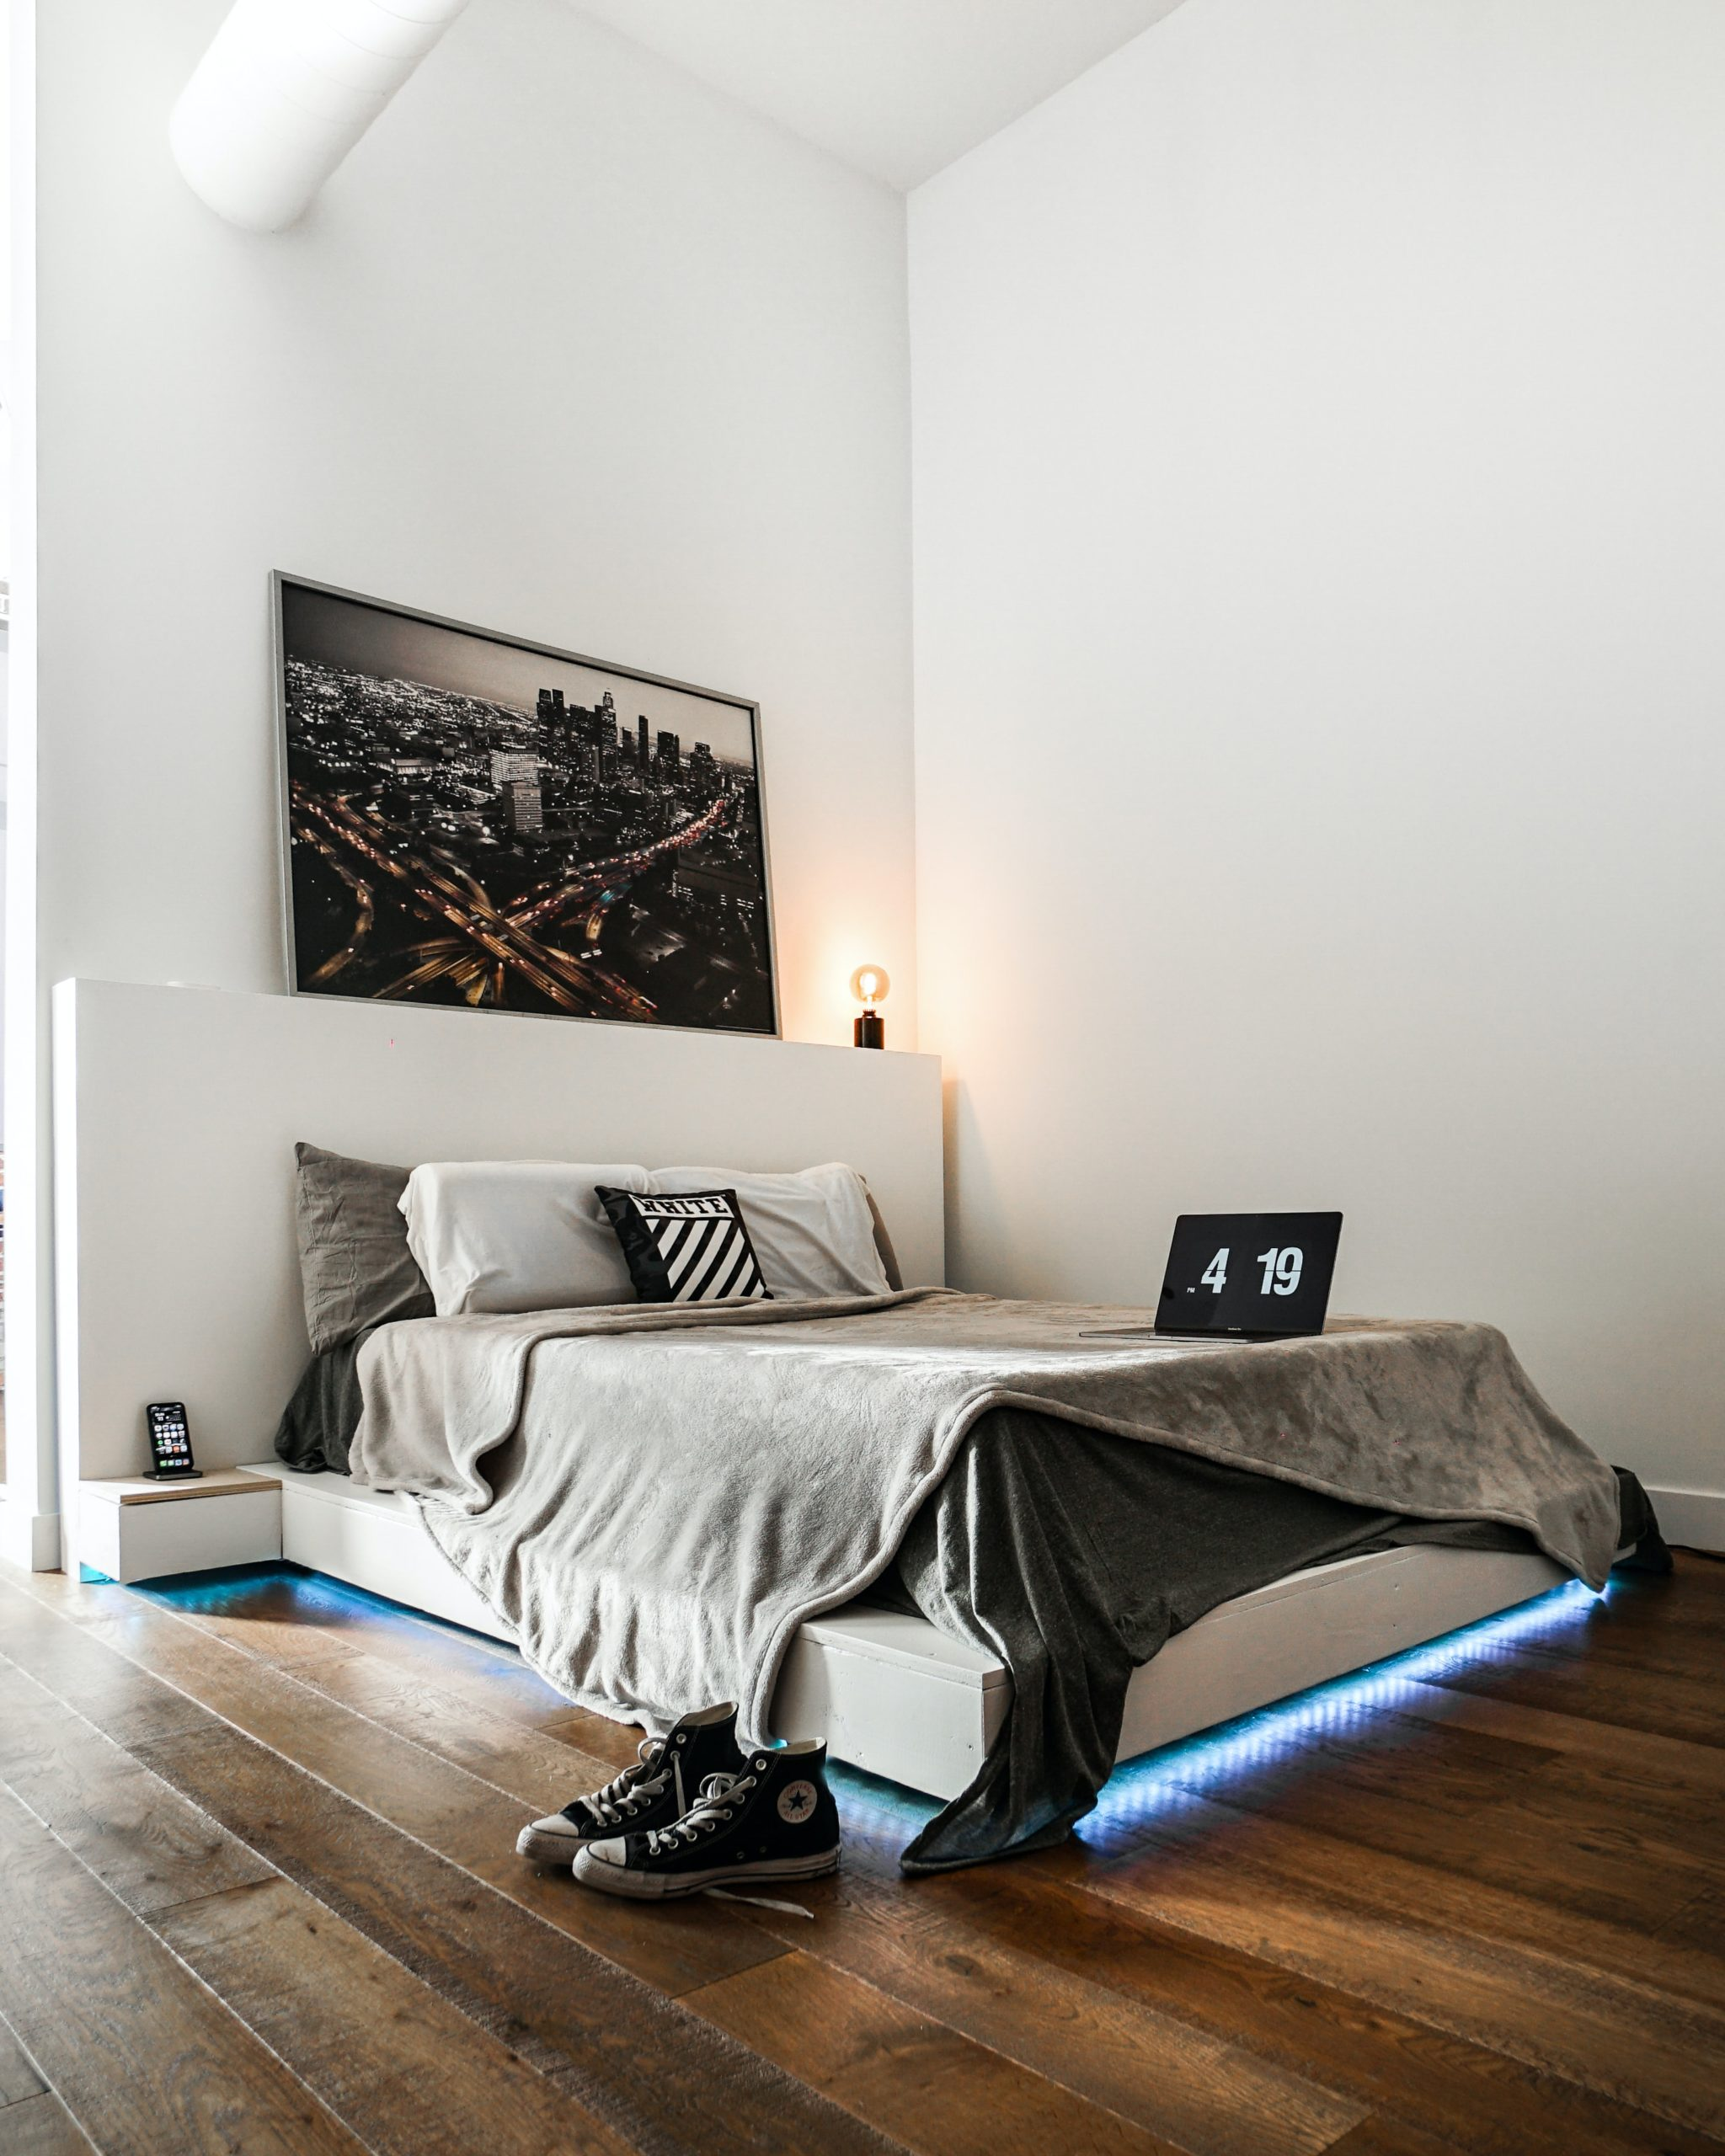 Small bedroom garin chadwick Simphome unsplash.jpg